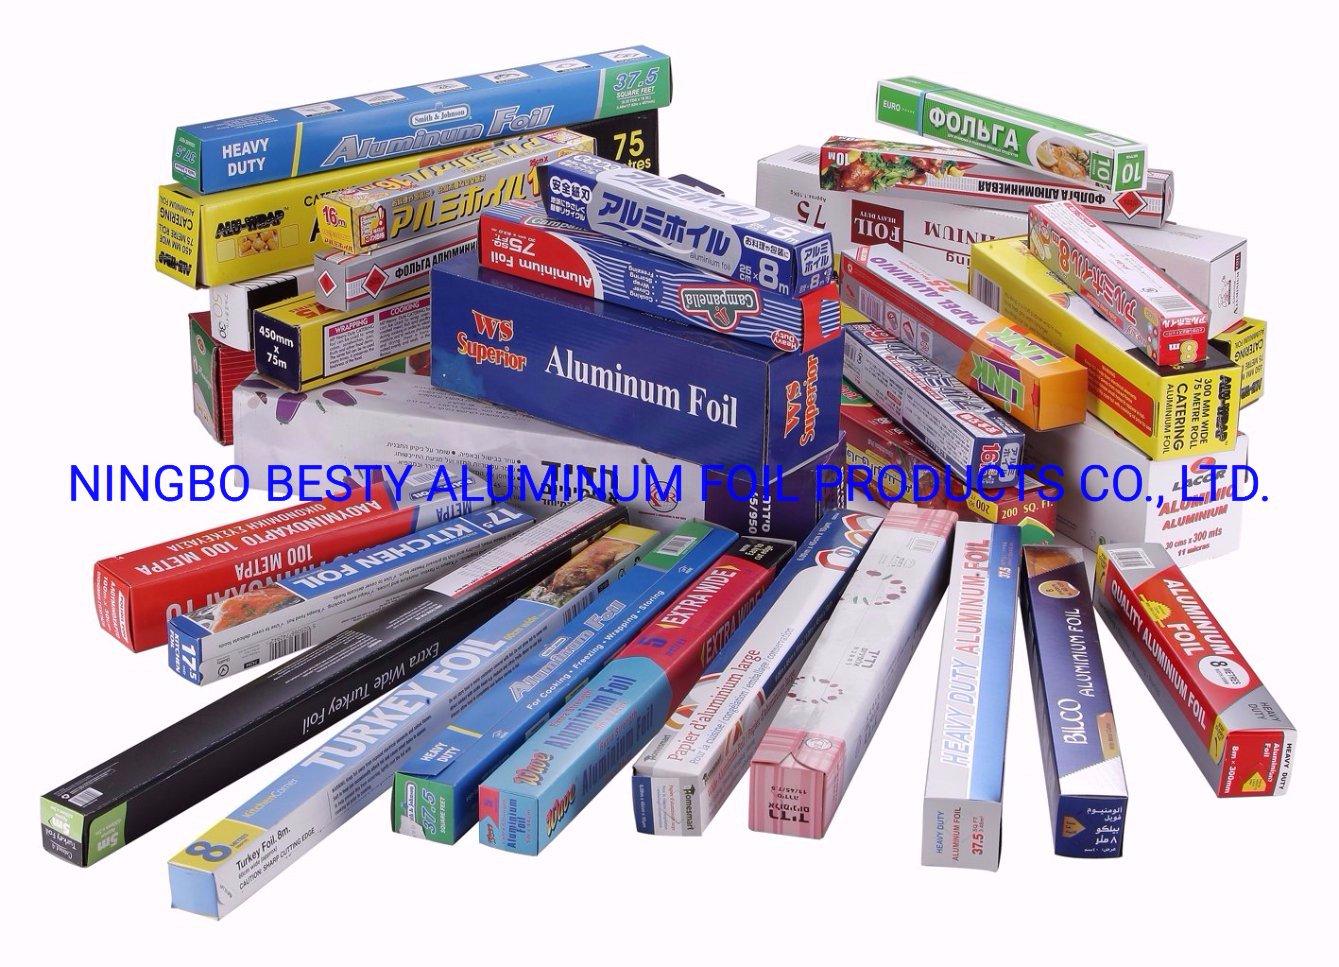 NINGBO BESTY ALUMINUM FOIL PRODUCTS CO., LTD.